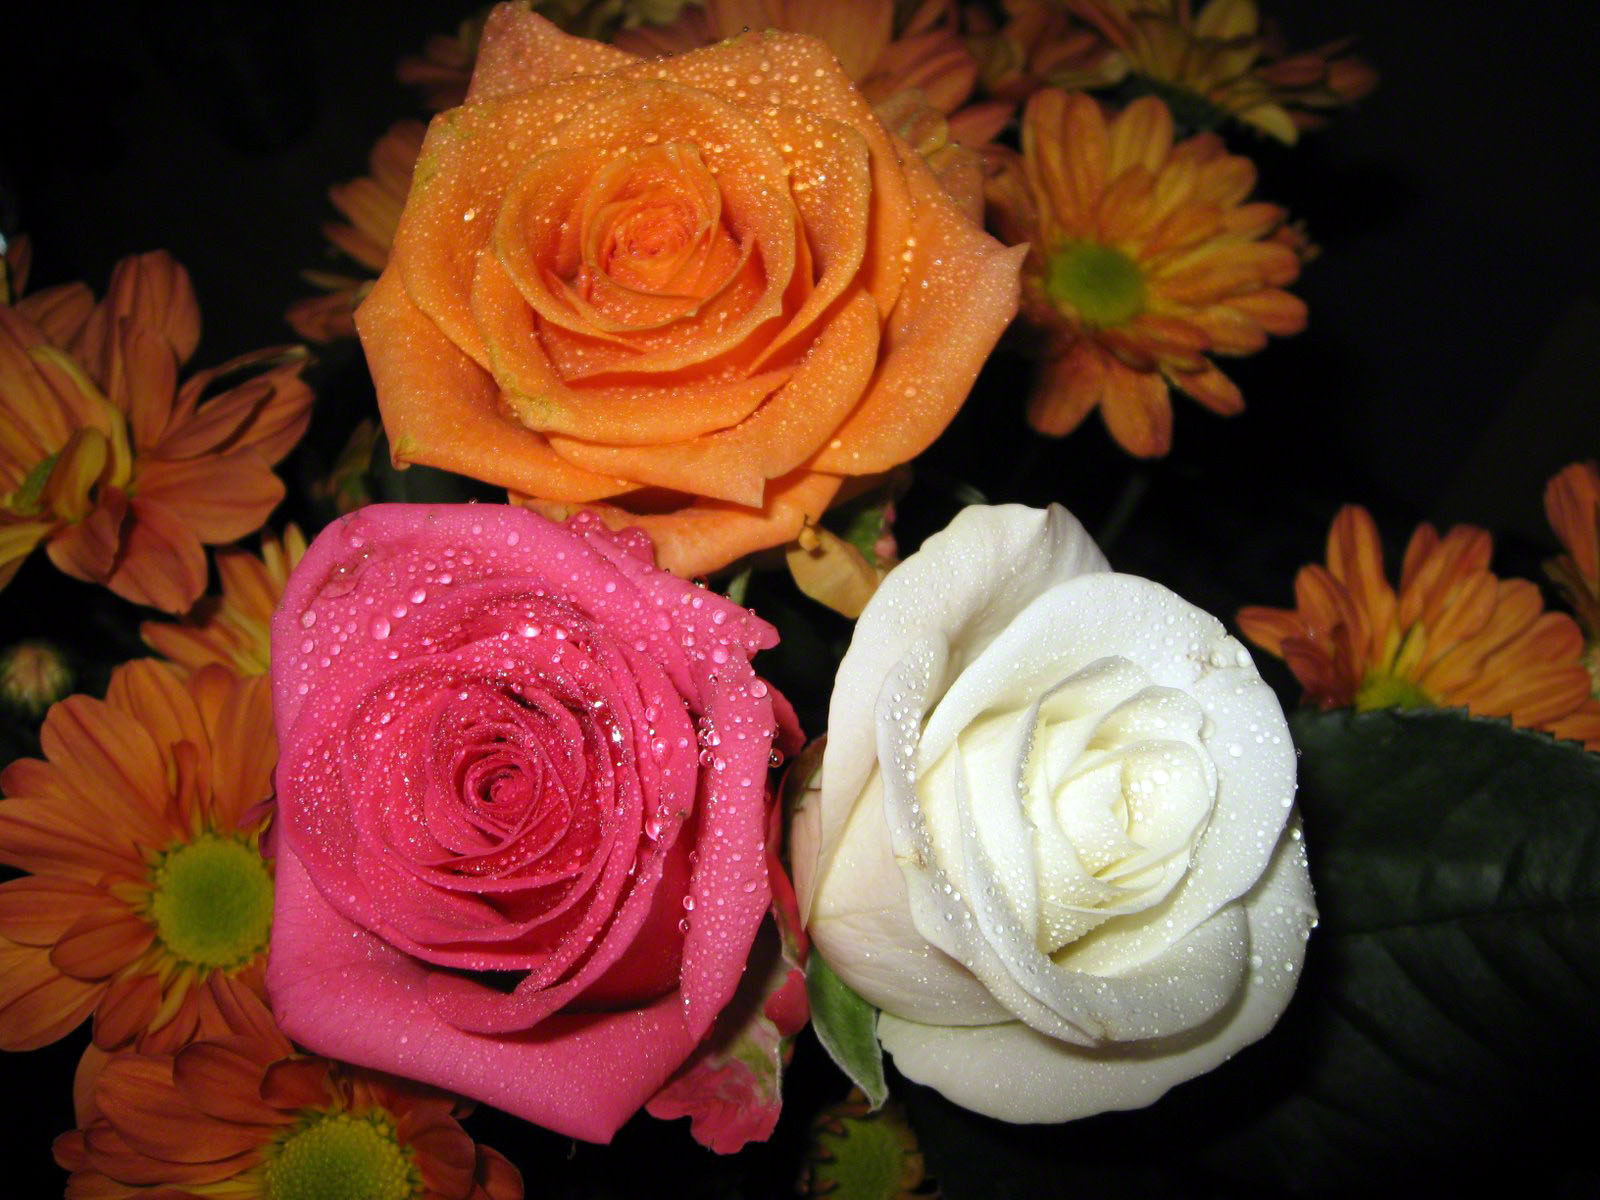 http://www.fabiovisentin.com/photography/photo/12/roses-wallpaper-roses-bouquets4483.JPG